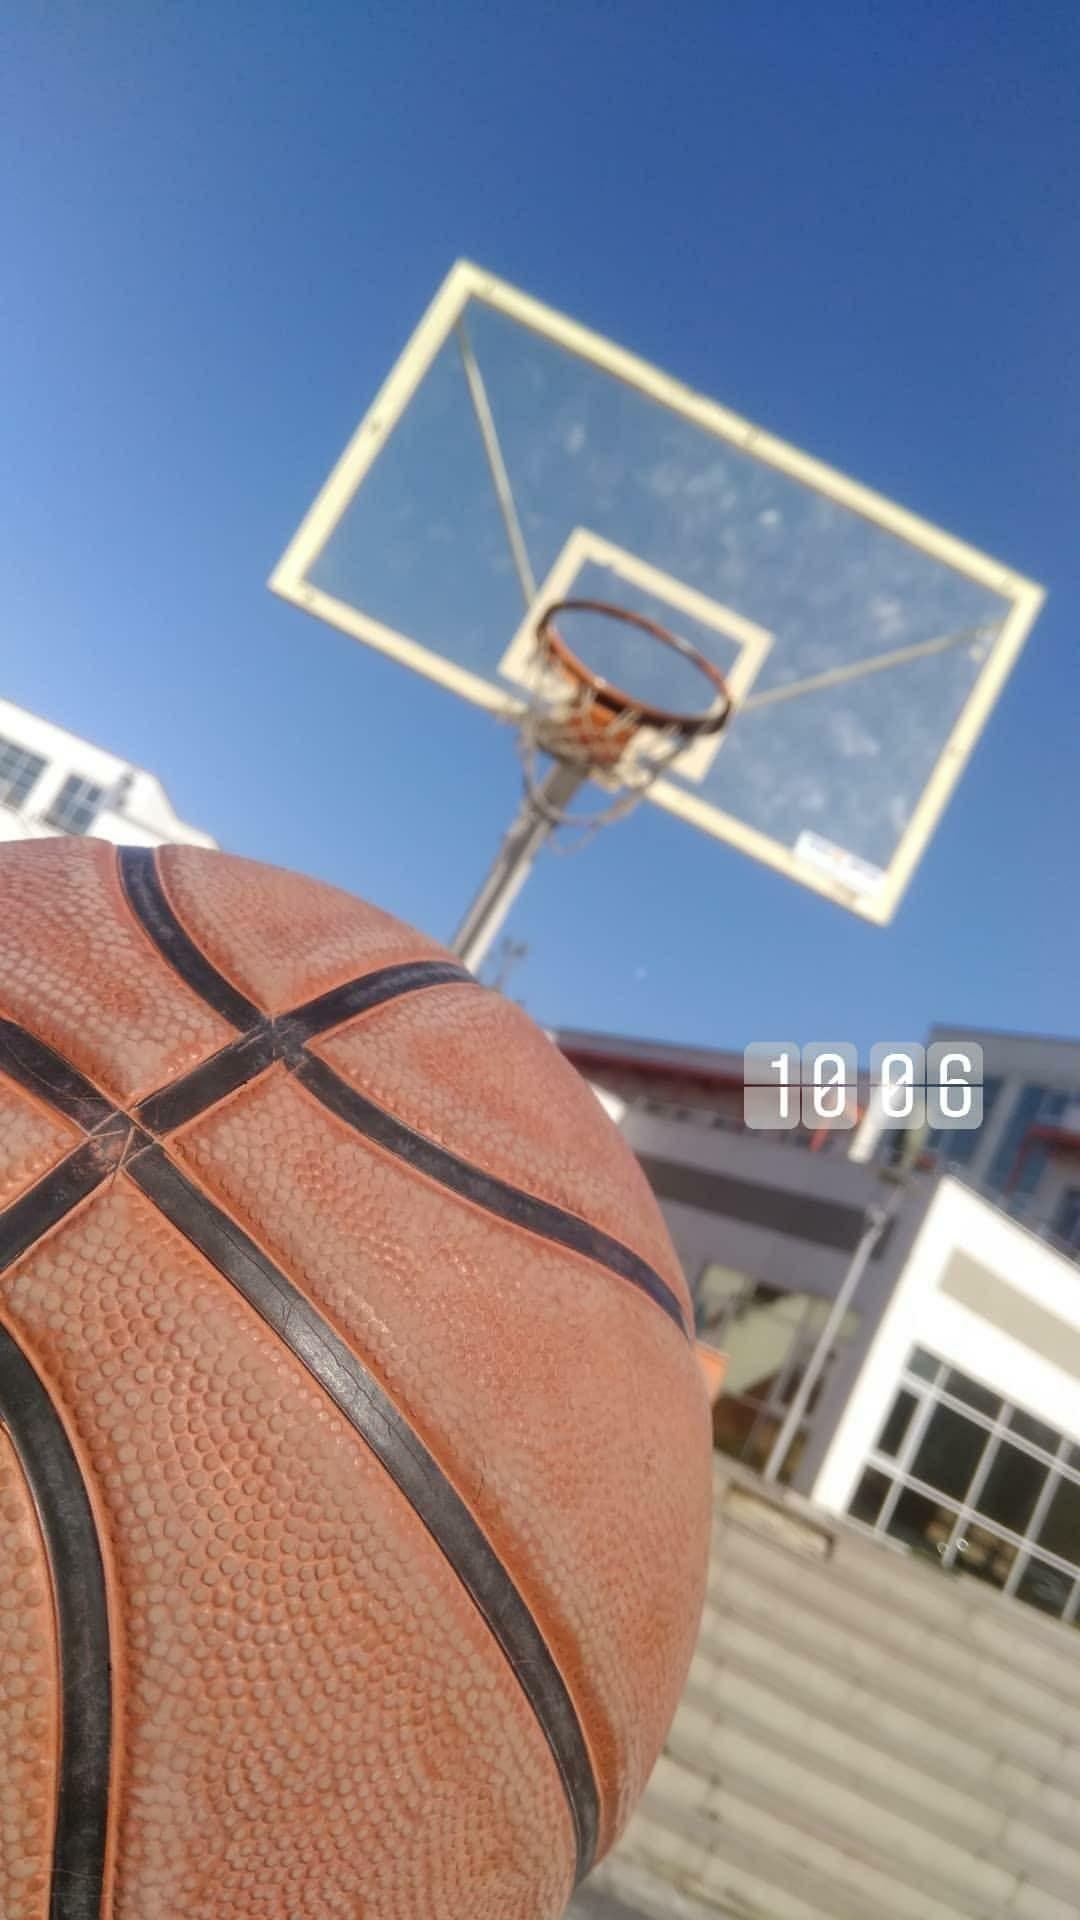 Fake Story Fake Instagram Basketbol Okul Yuzu Gozukmeyen Kiz Gambar Bola Basket Trik Fotografi Fotografi